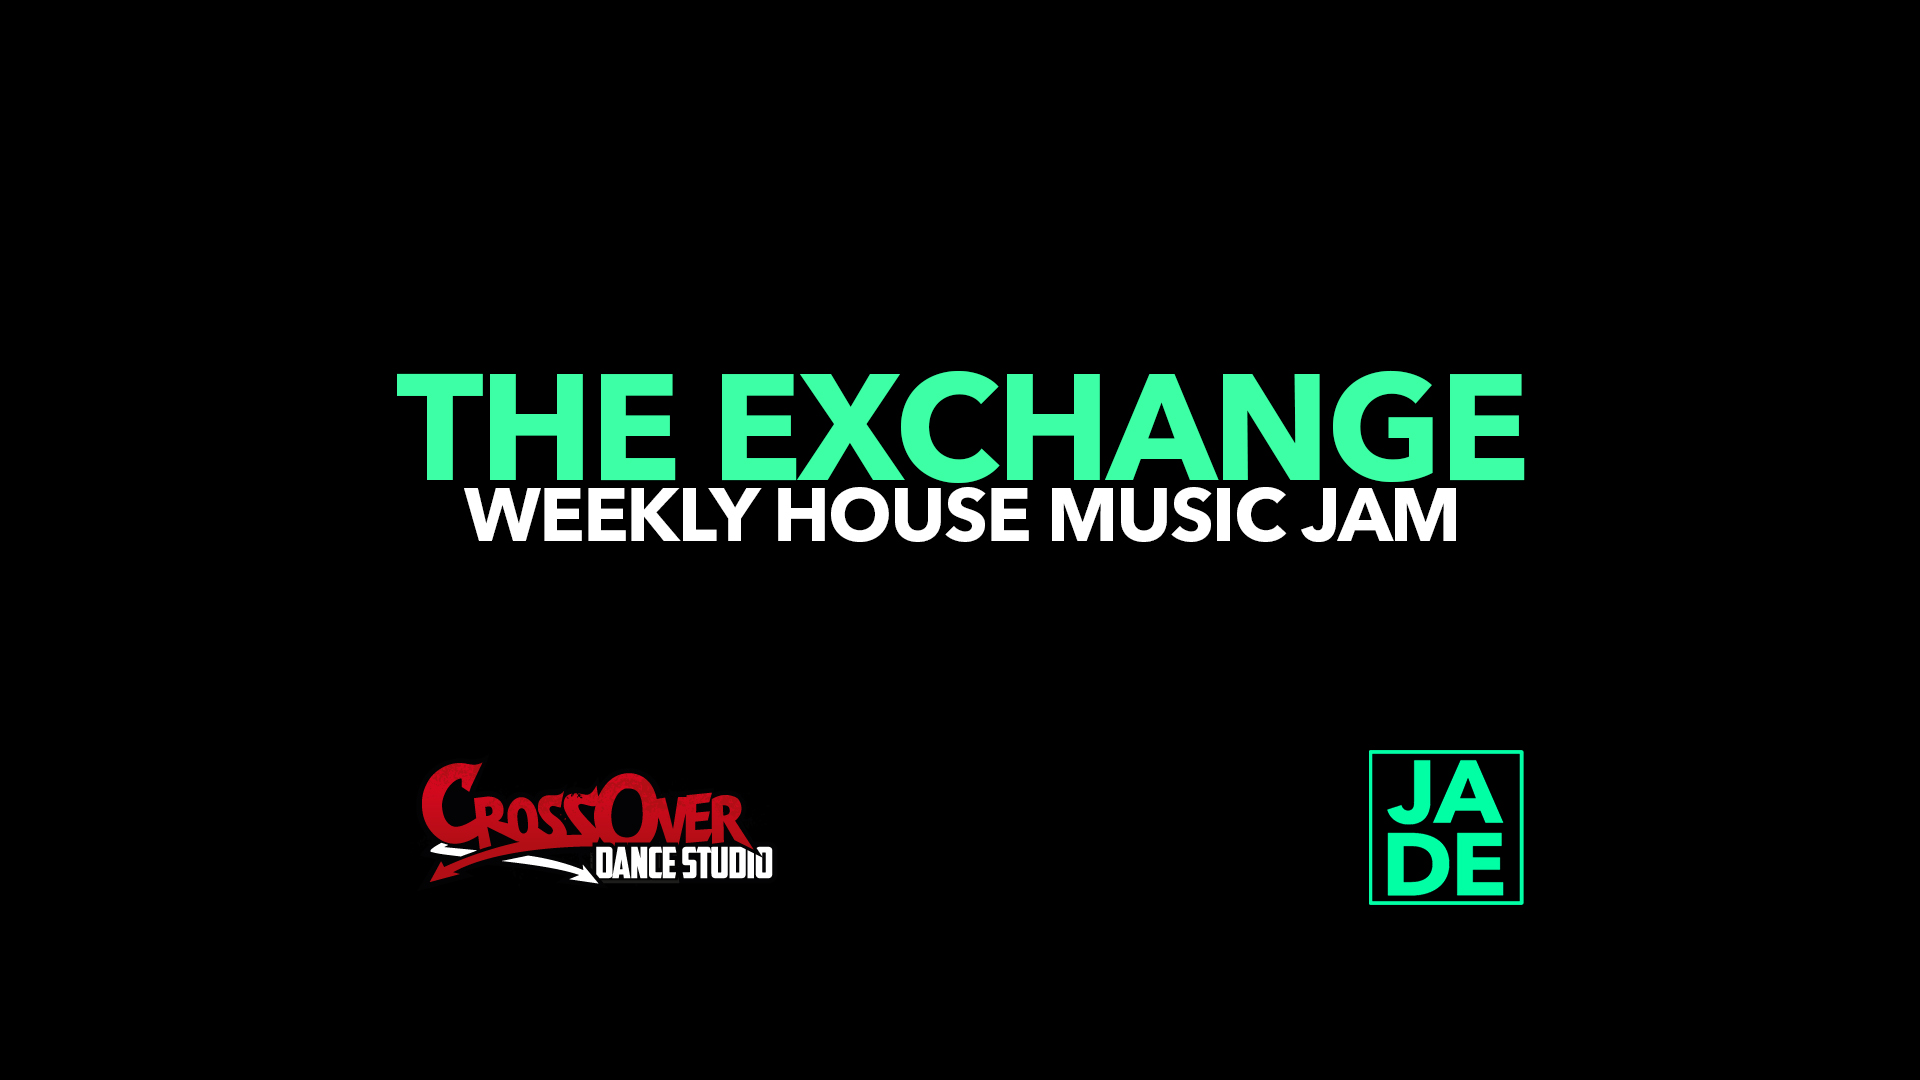 The Exchange: Weekly House Music Jam